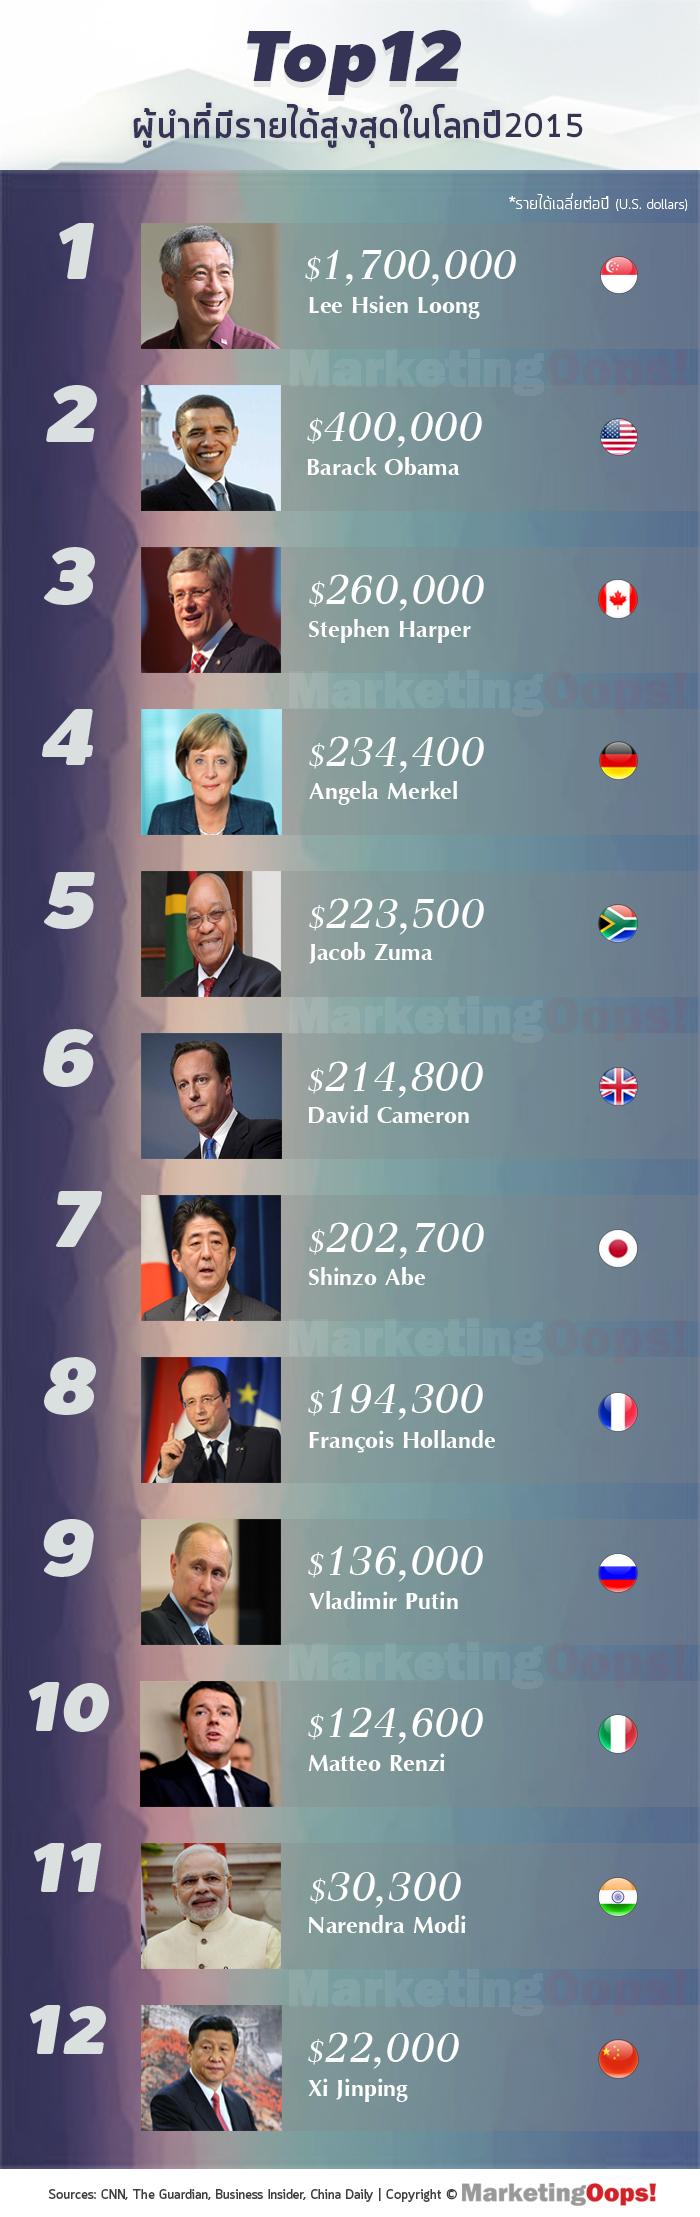 top12 ผู้นำรายได้มากที่สุดในโลกจ้าาา